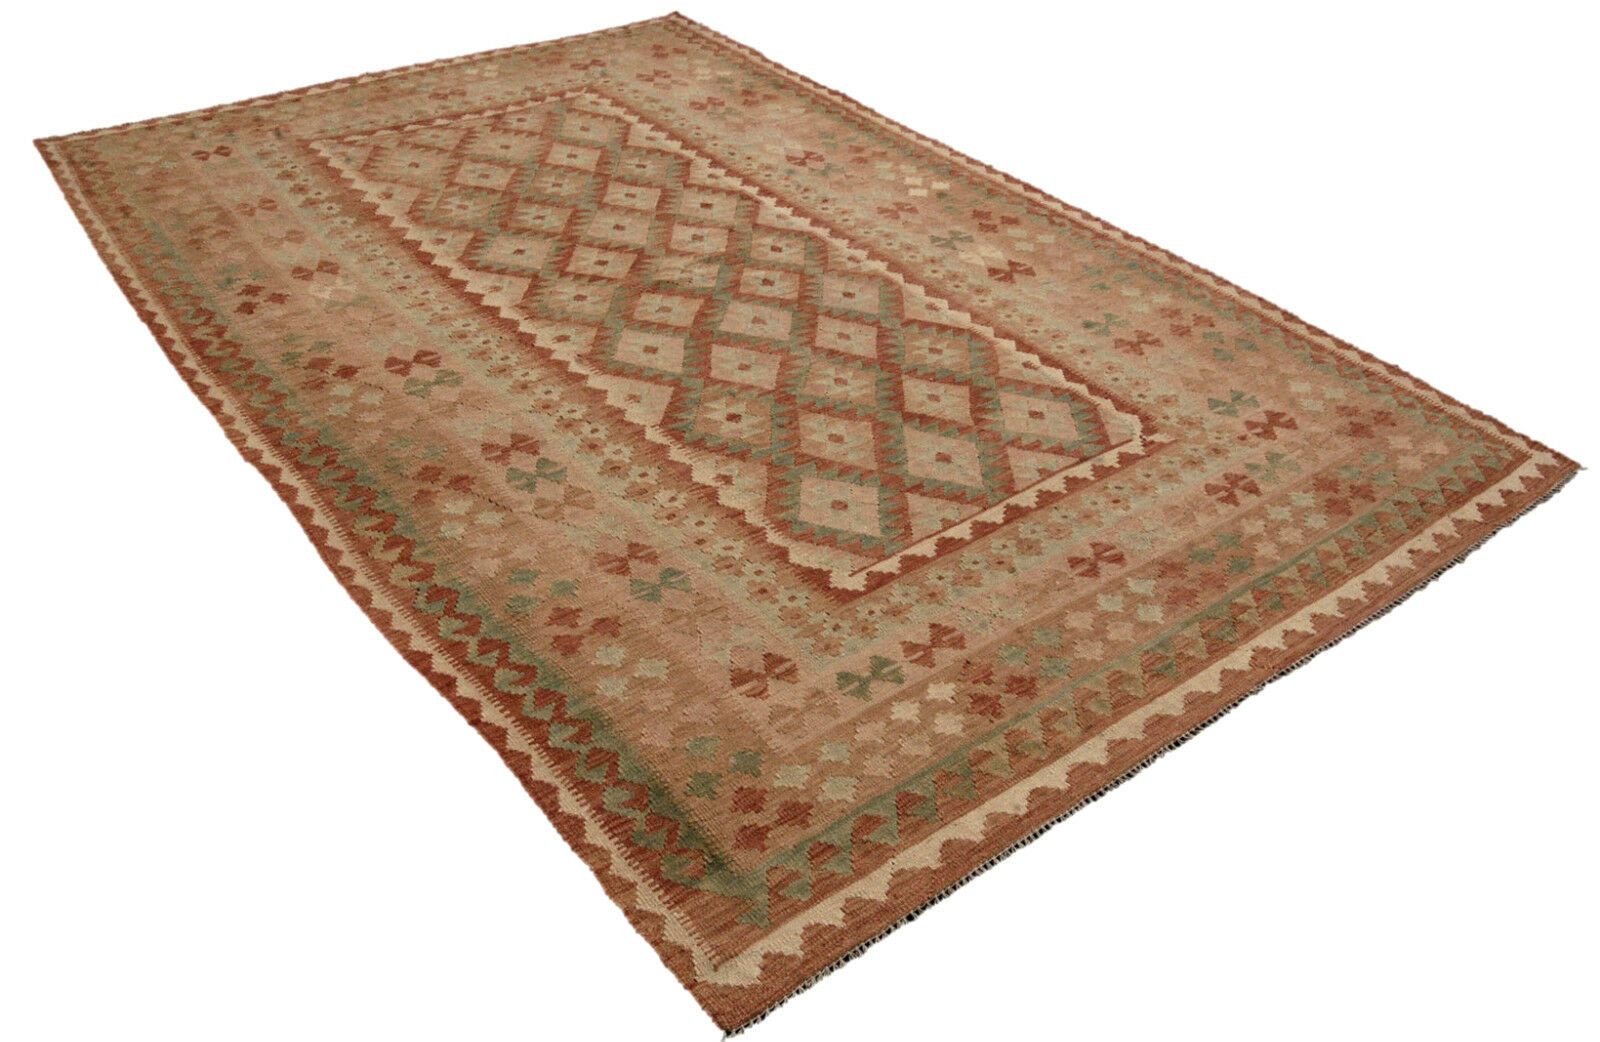 Kilim Kilim Afghan maimana 300 x 200 Orient alfombra plana tejidos handweb landhaus